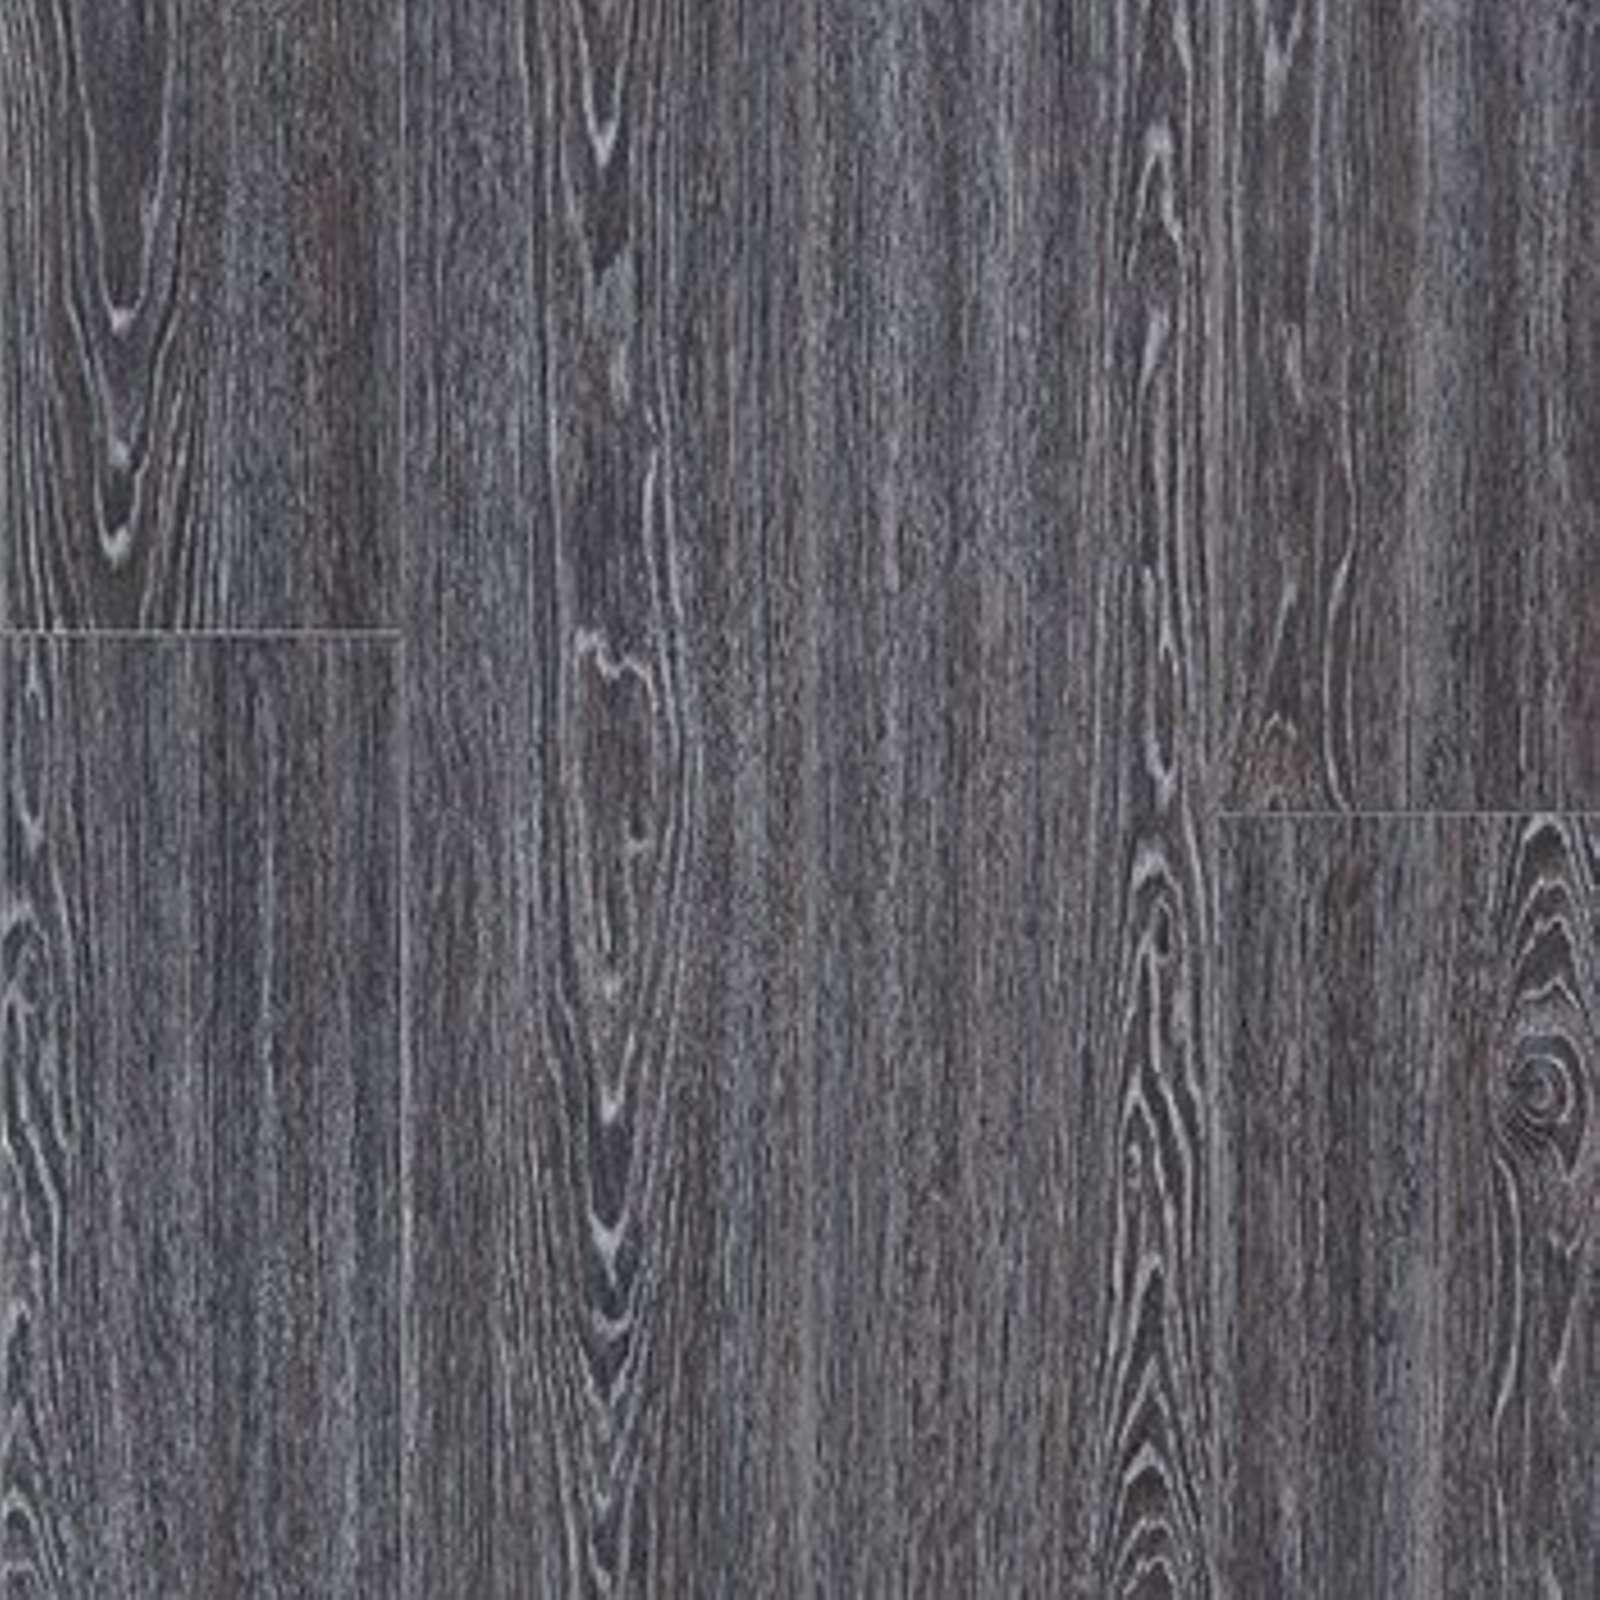 Плитка ПВХ Tarkett Art Vinil Lounge Costes 101,6х914,4x3 мм (2,04м2/22шт/уп) 257010009